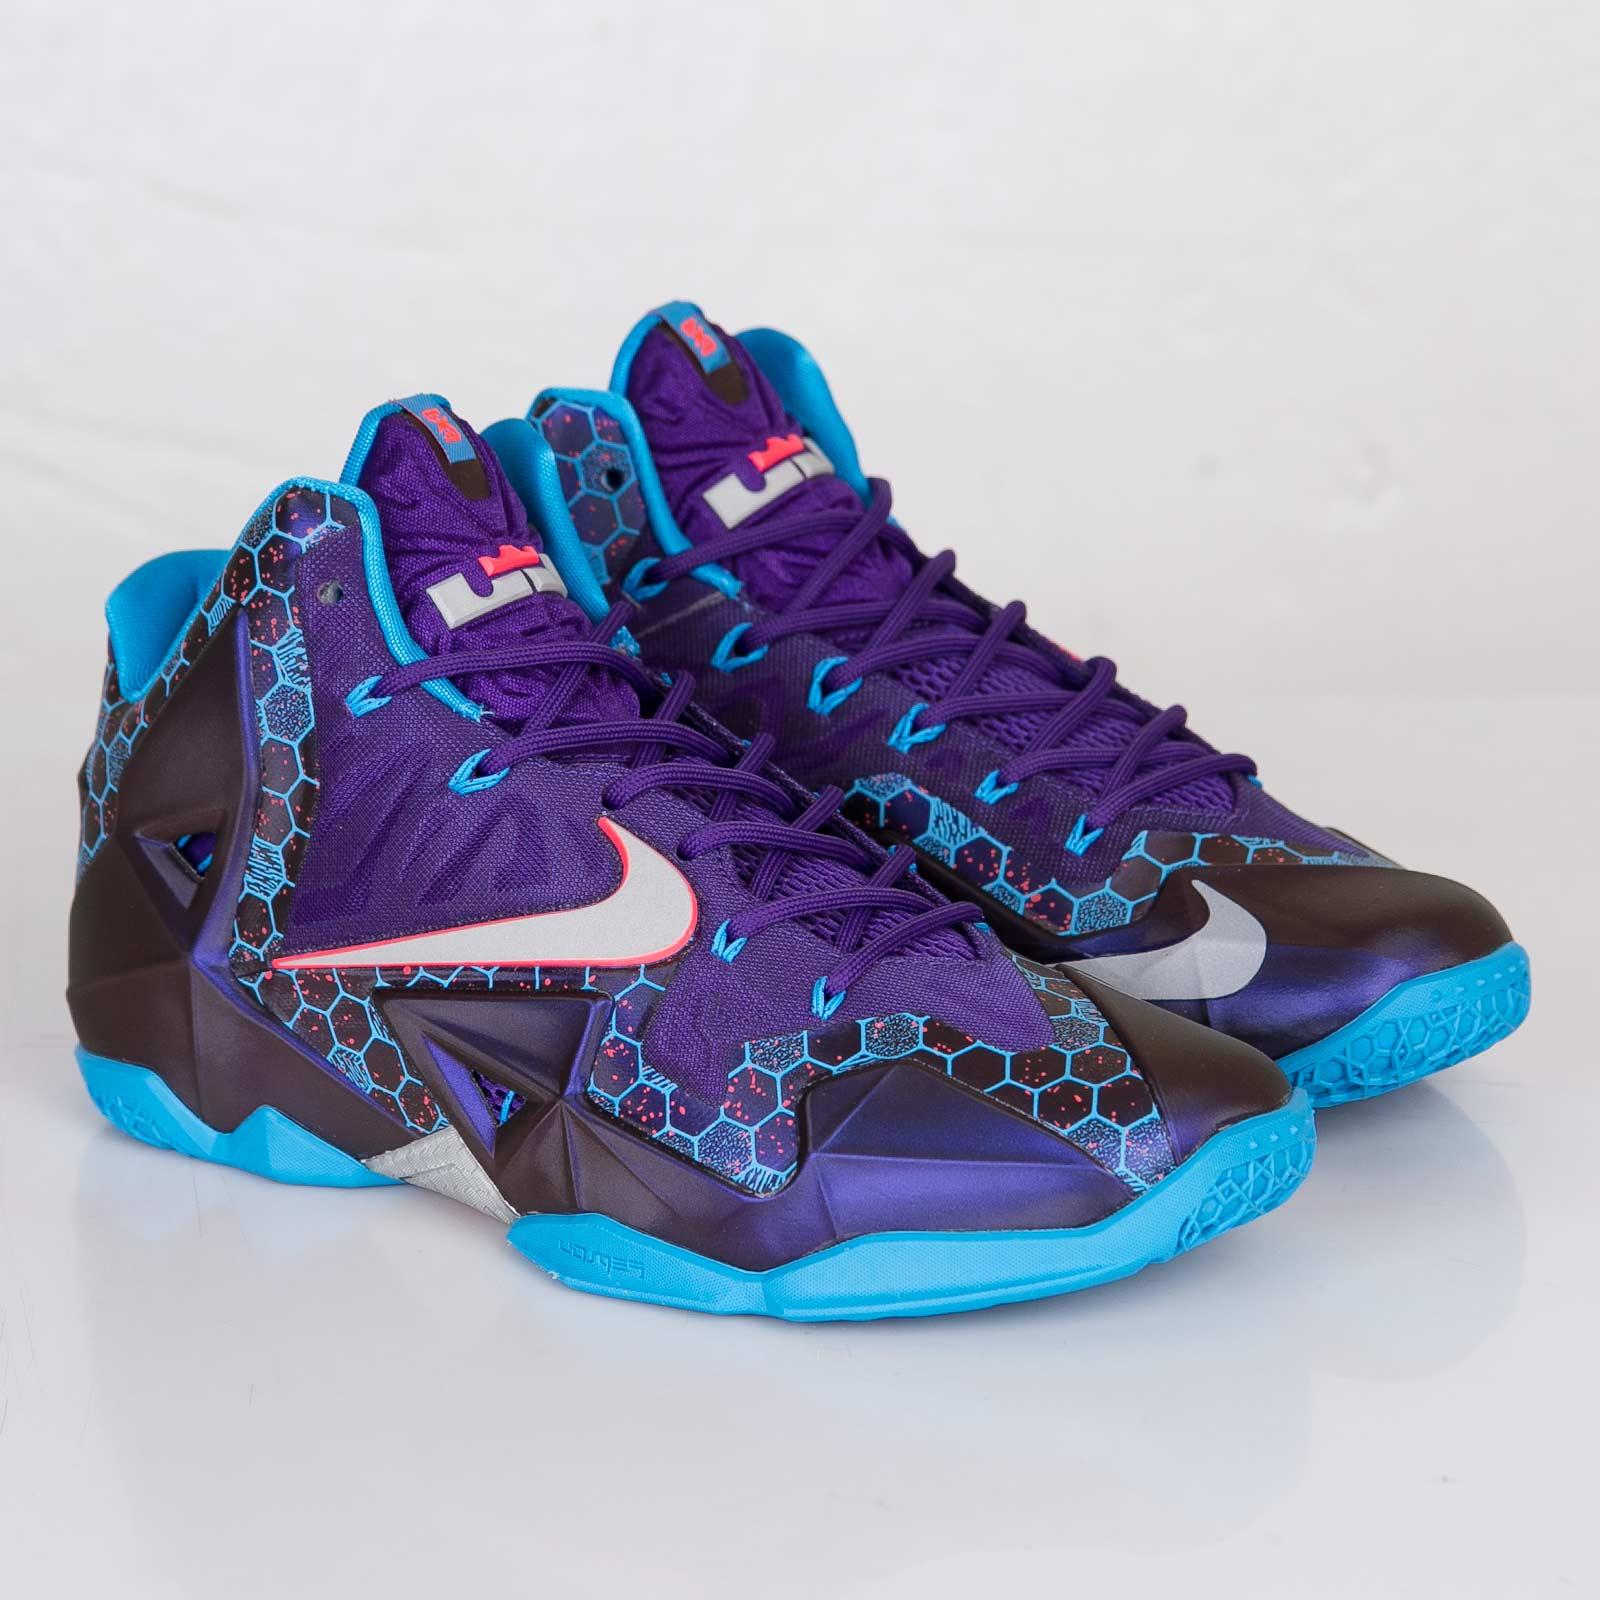 0f4c2ae1e6f37c Nike Lebron XI - 616175-500 - Sneakersnstuff